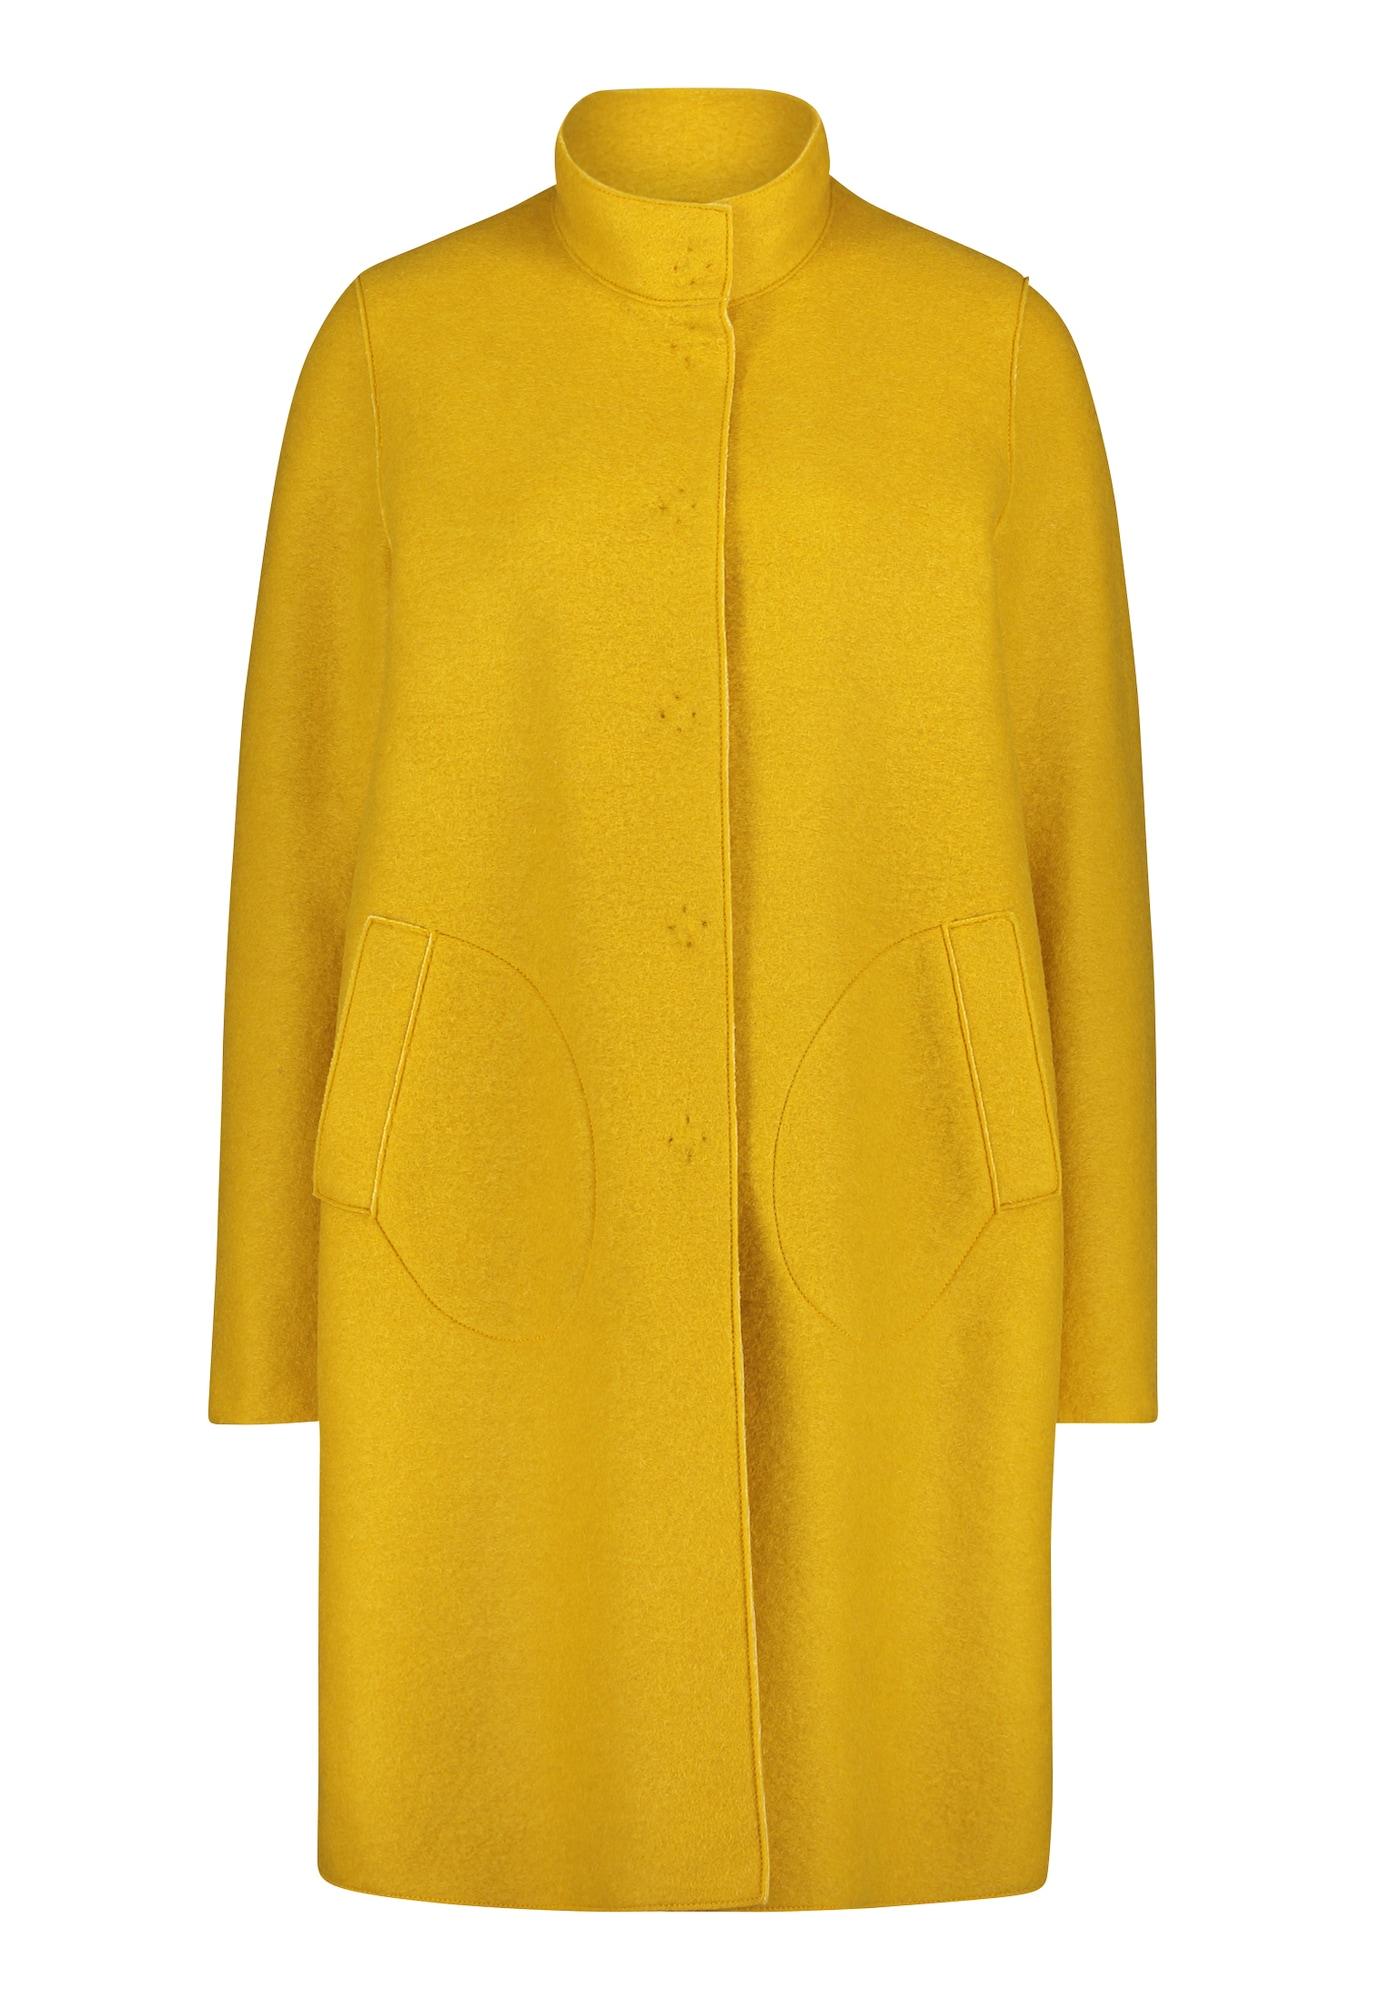 Cartoon Demisezoninis paltas geltona